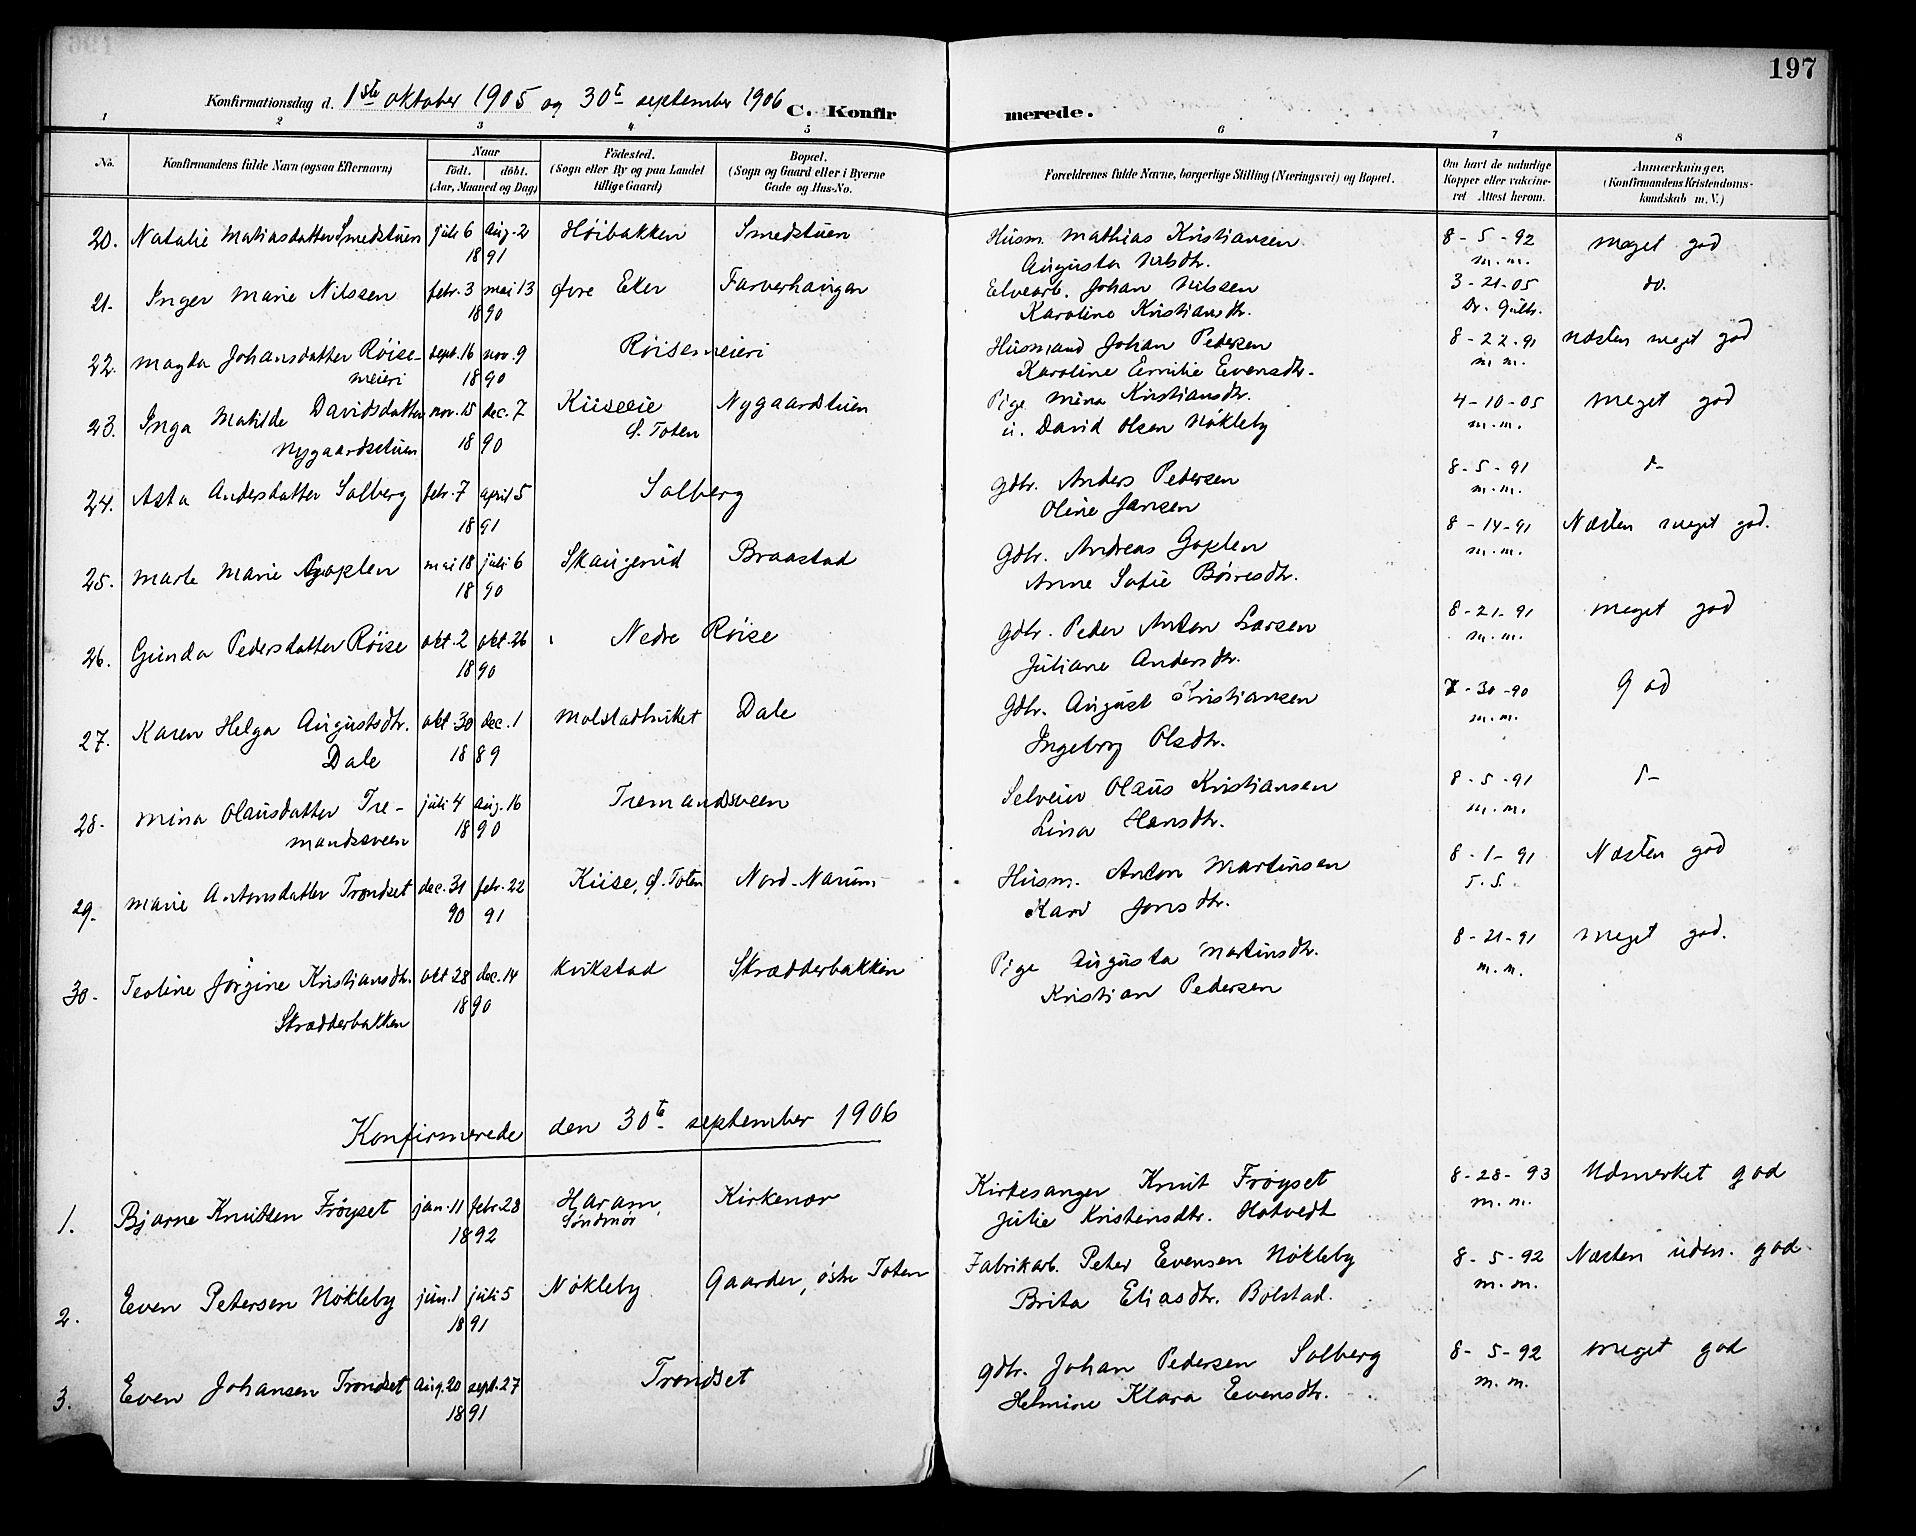 SAH, Vestre Toten prestekontor, H/Ha/Haa/L0013: Ministerialbok nr. 13, 1895-1911, s. 197